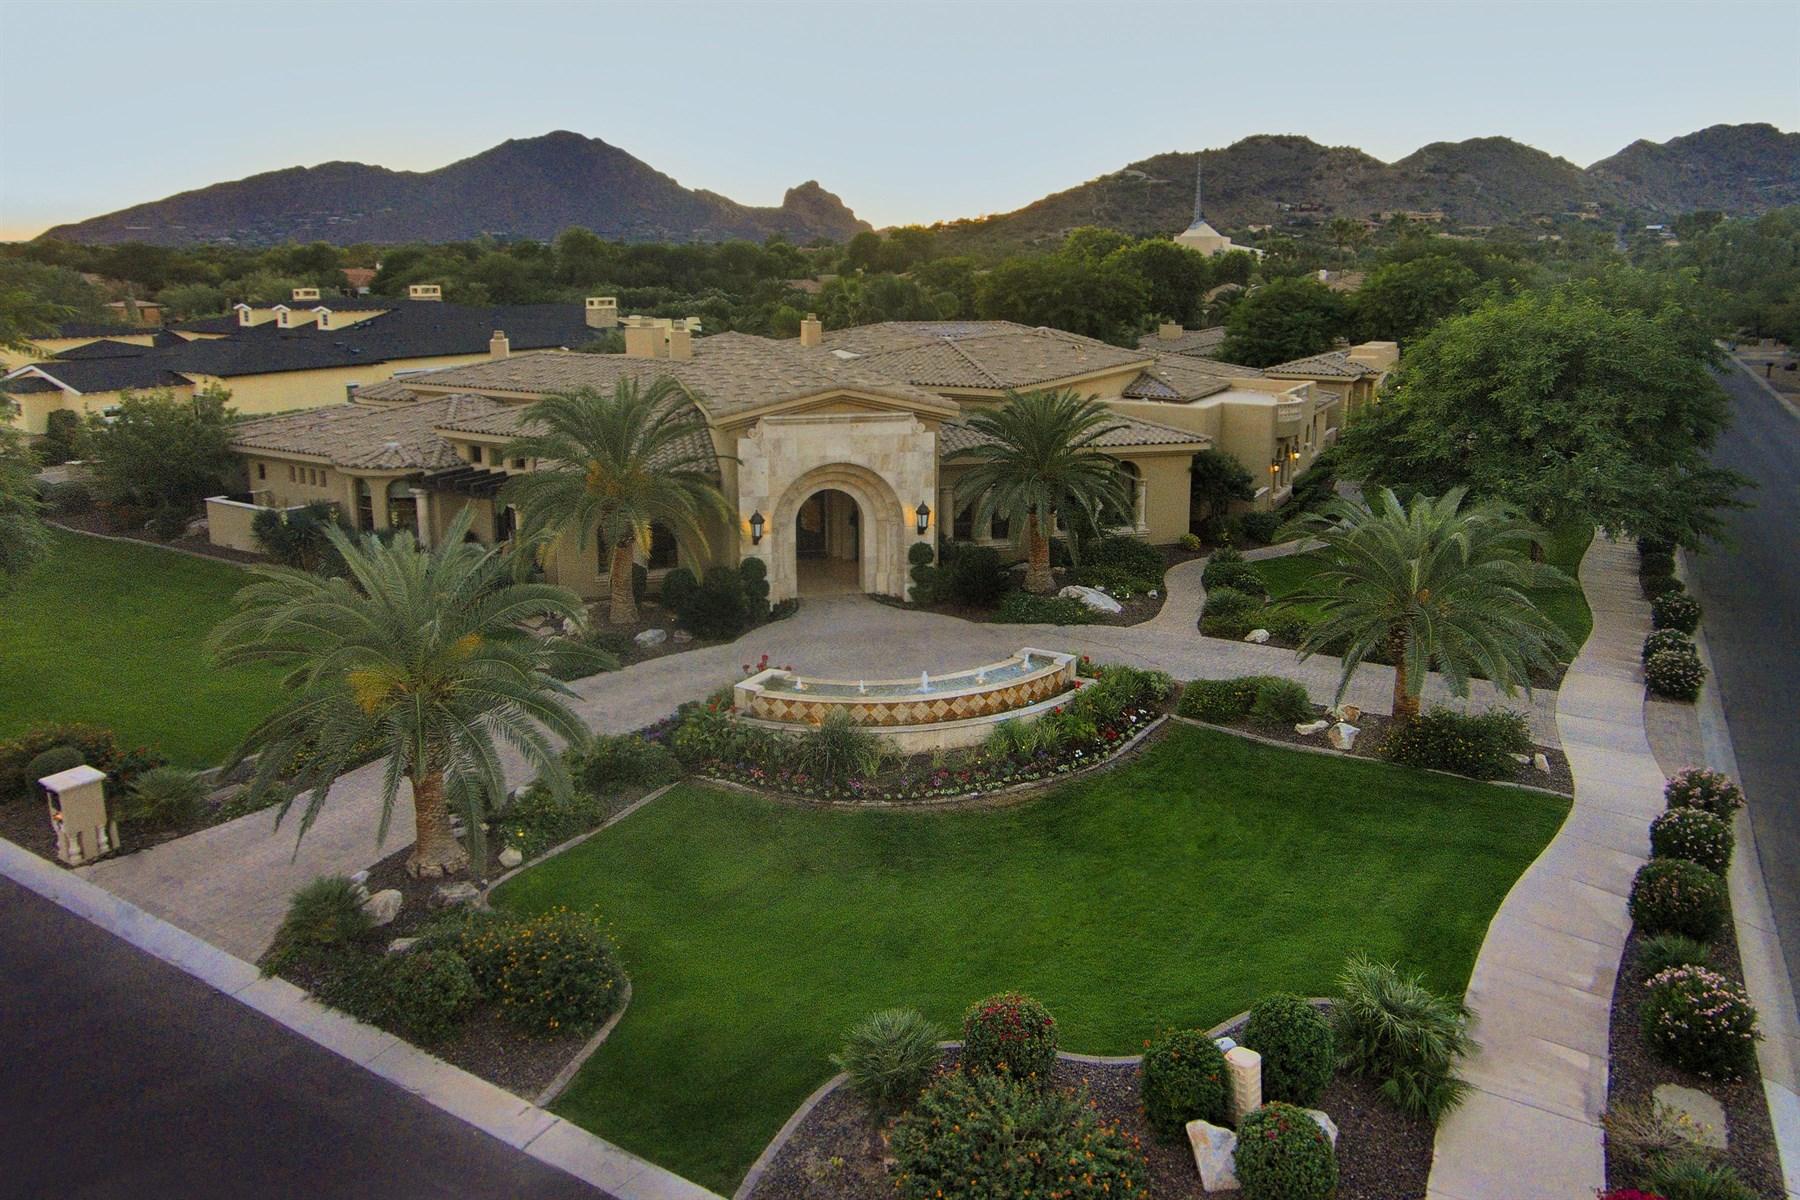 Casa Unifamiliar por un Venta en World-Class Architectural Ed Chavez Residence On Estate Size Lot 7170 N 69th Place Paradise Valley, Arizona, 85253 Estados Unidos